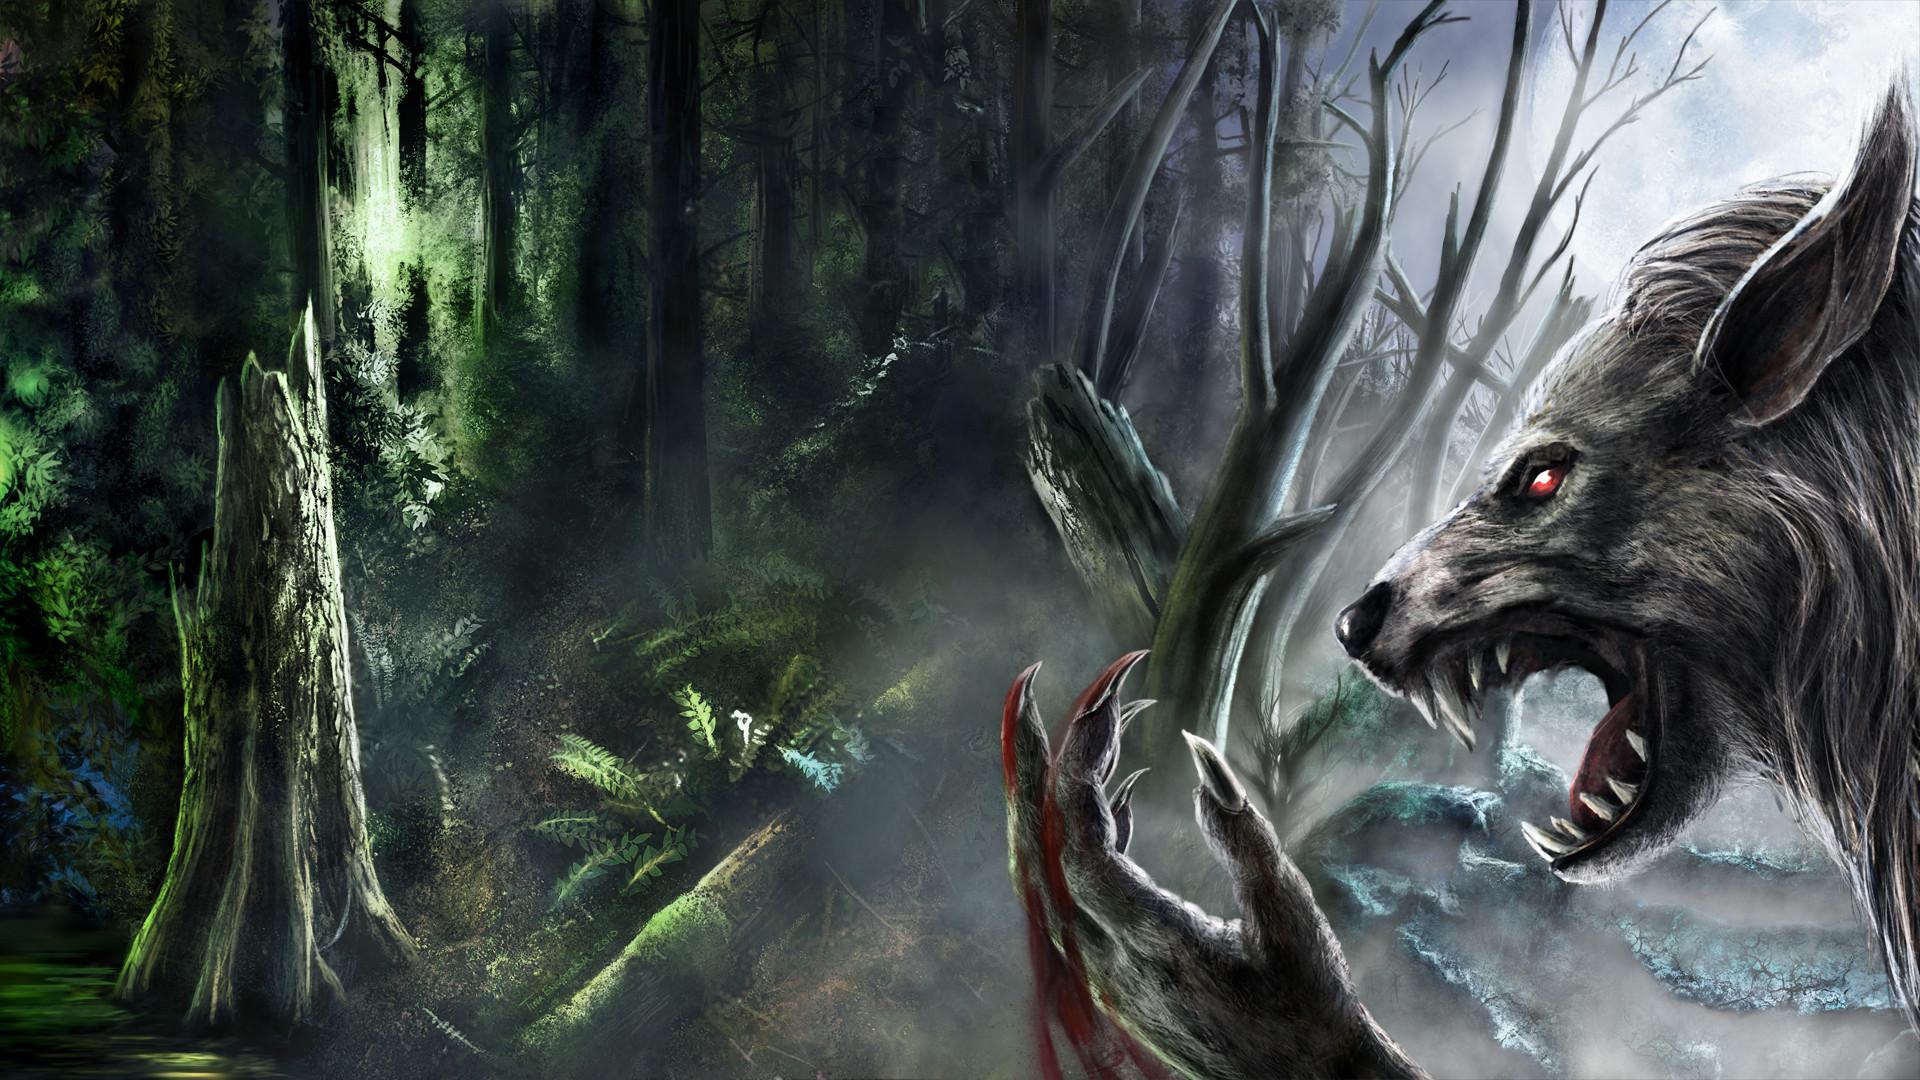 Werewolf fantasy art dark monster creatures blood fangs trees forest spooky  creepy scary evil wallpaper |